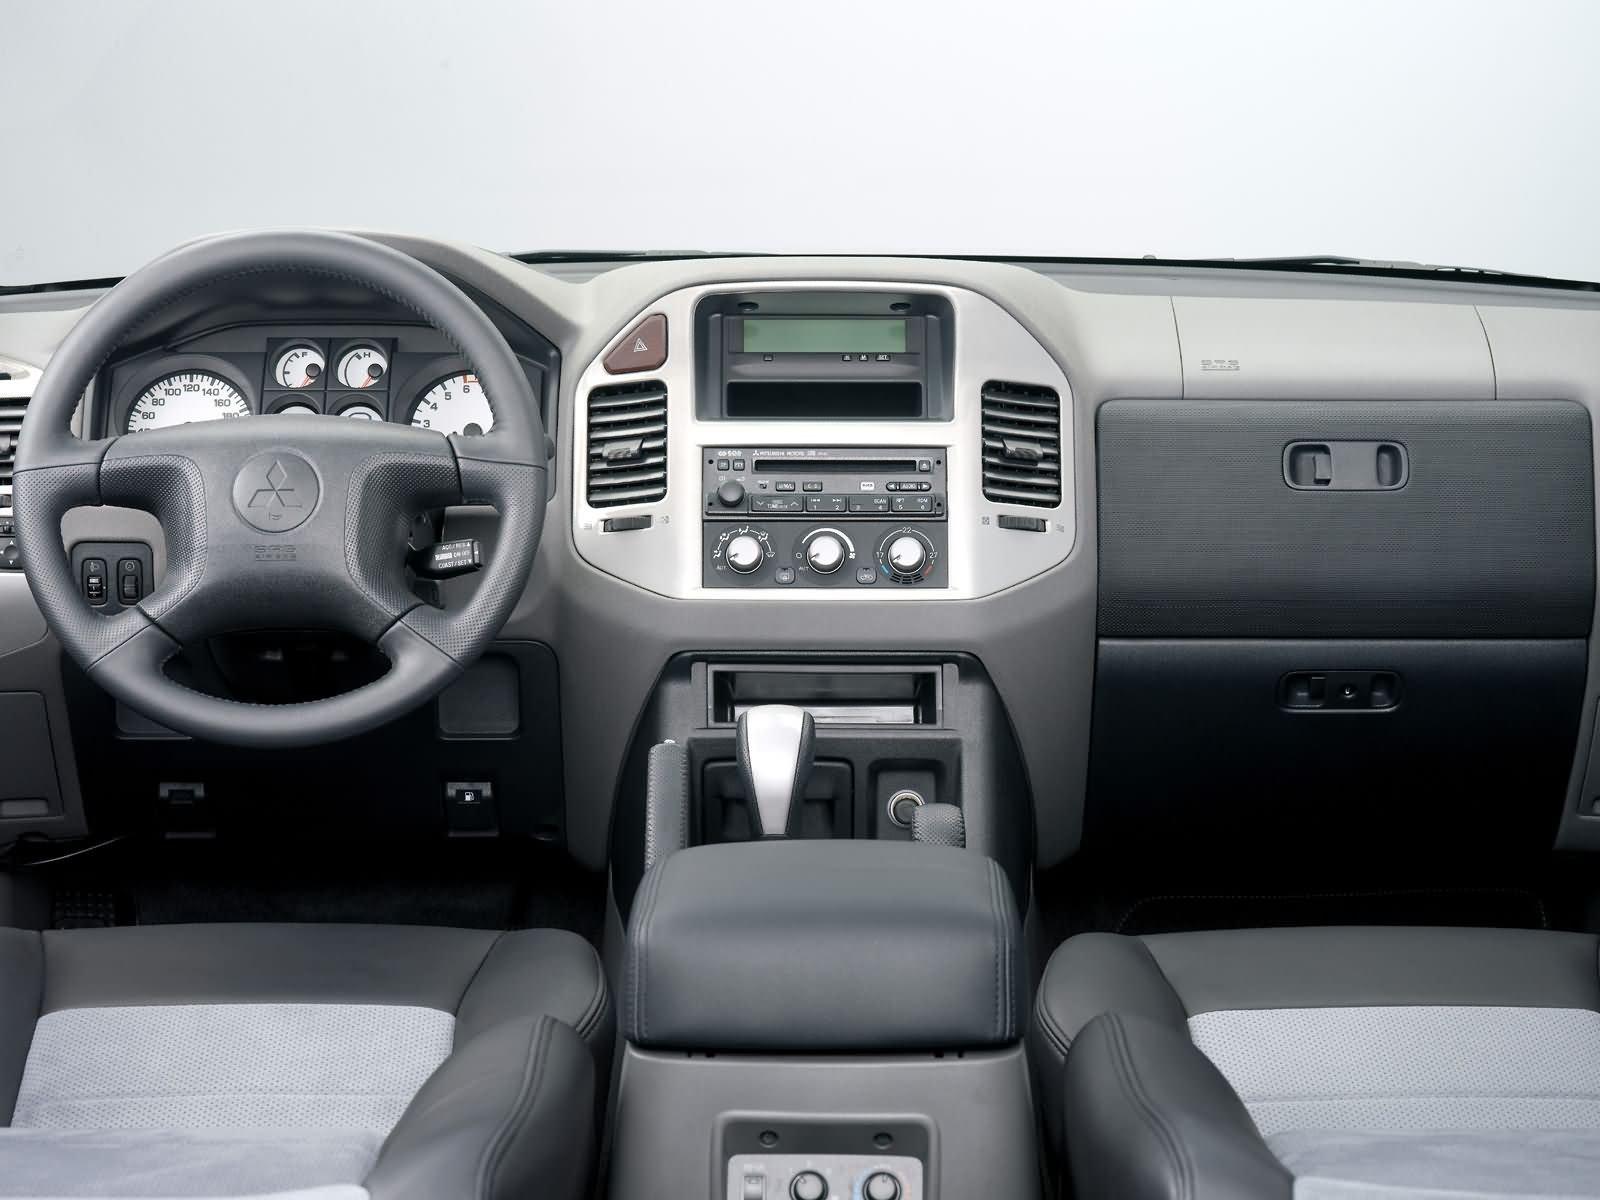 Коды неисправностей Mitsubishi Pajero 3 с АКПП